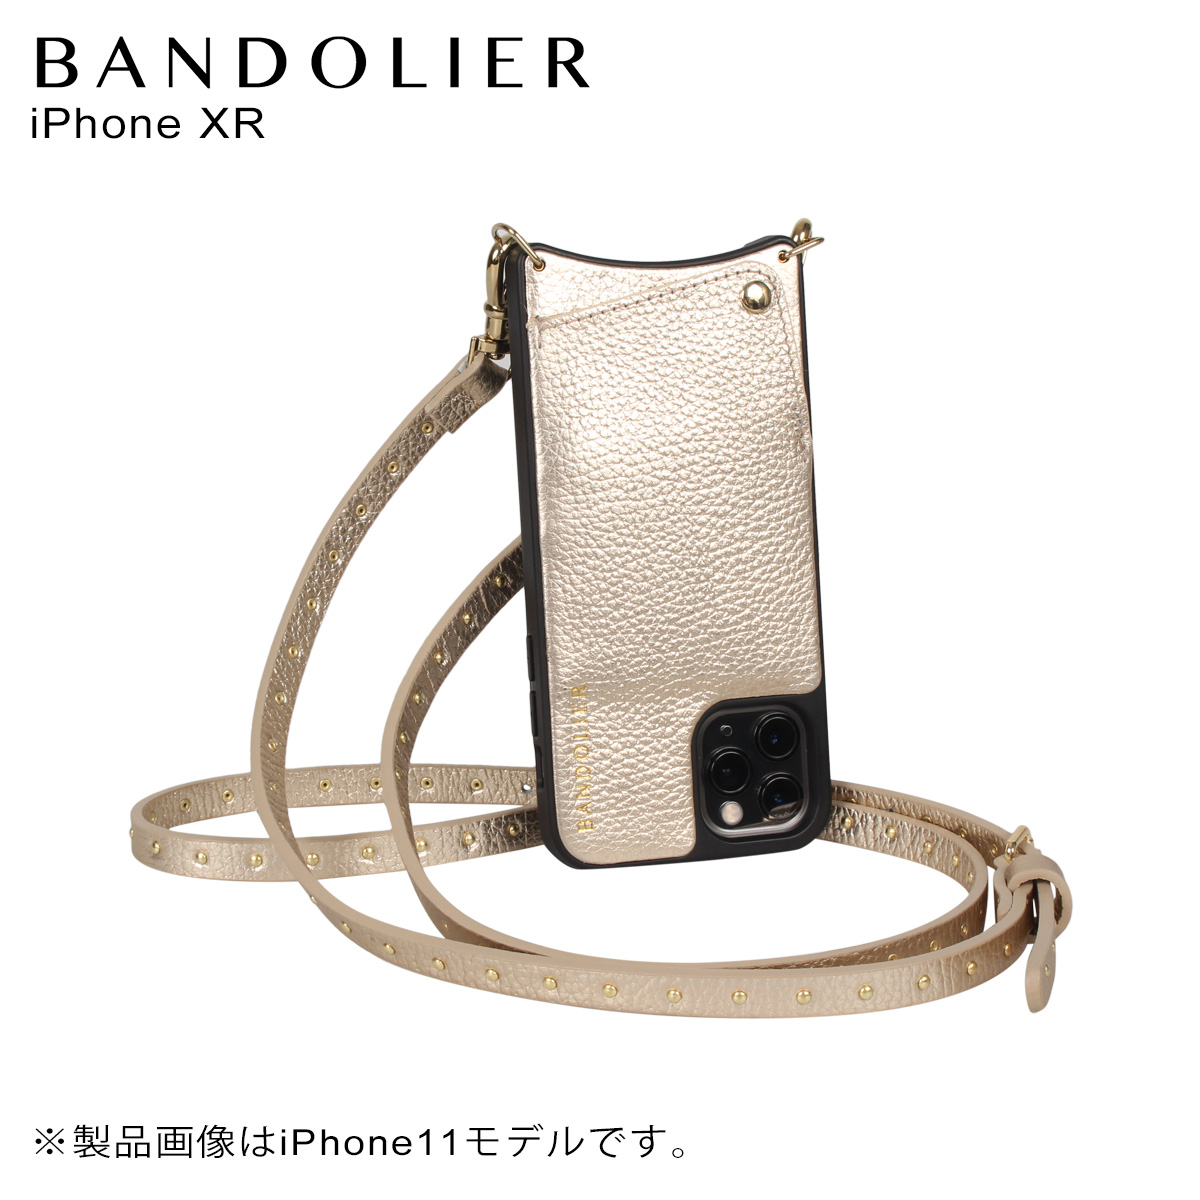 BANDOLIER バンドリヤー iPhone XR ケース スマホ 携帯 ショルダー アイフォン メンズ レディース レザー NICOLE RICH GOLD ゴールド 10NIC